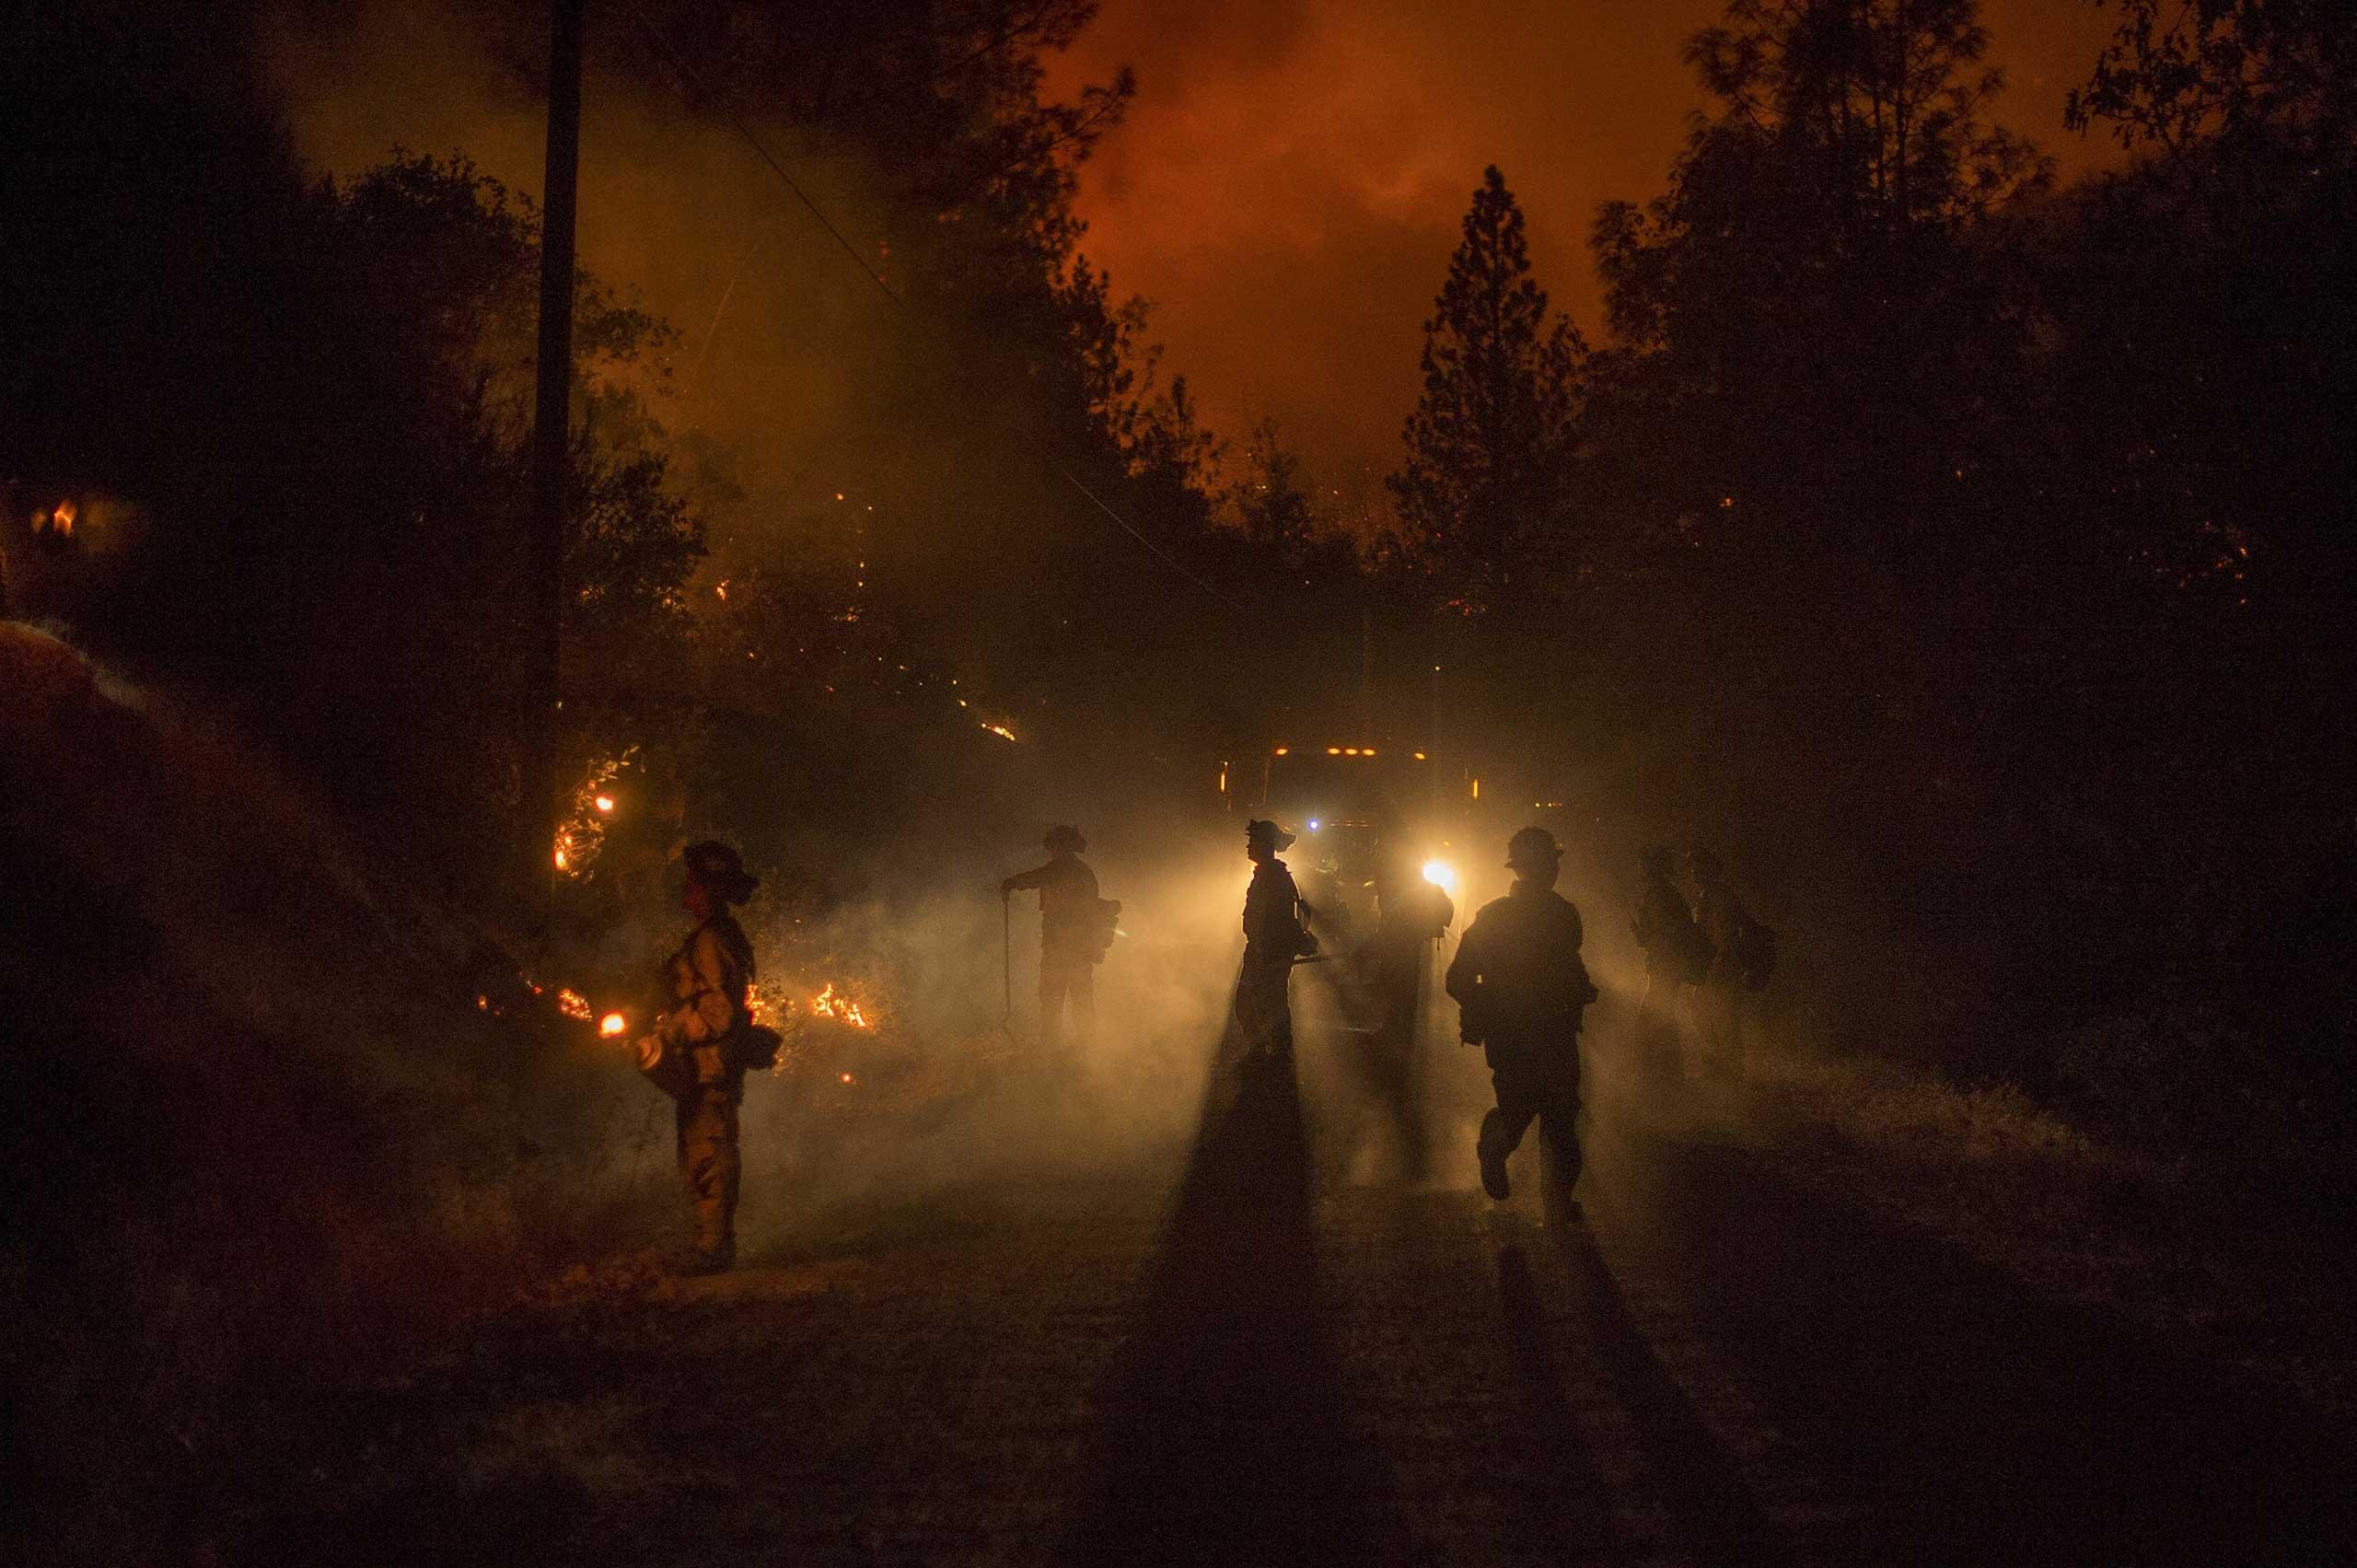 Firefighters light a backfire while battling the Butte fire near San Andreas, California September 12, 2015.